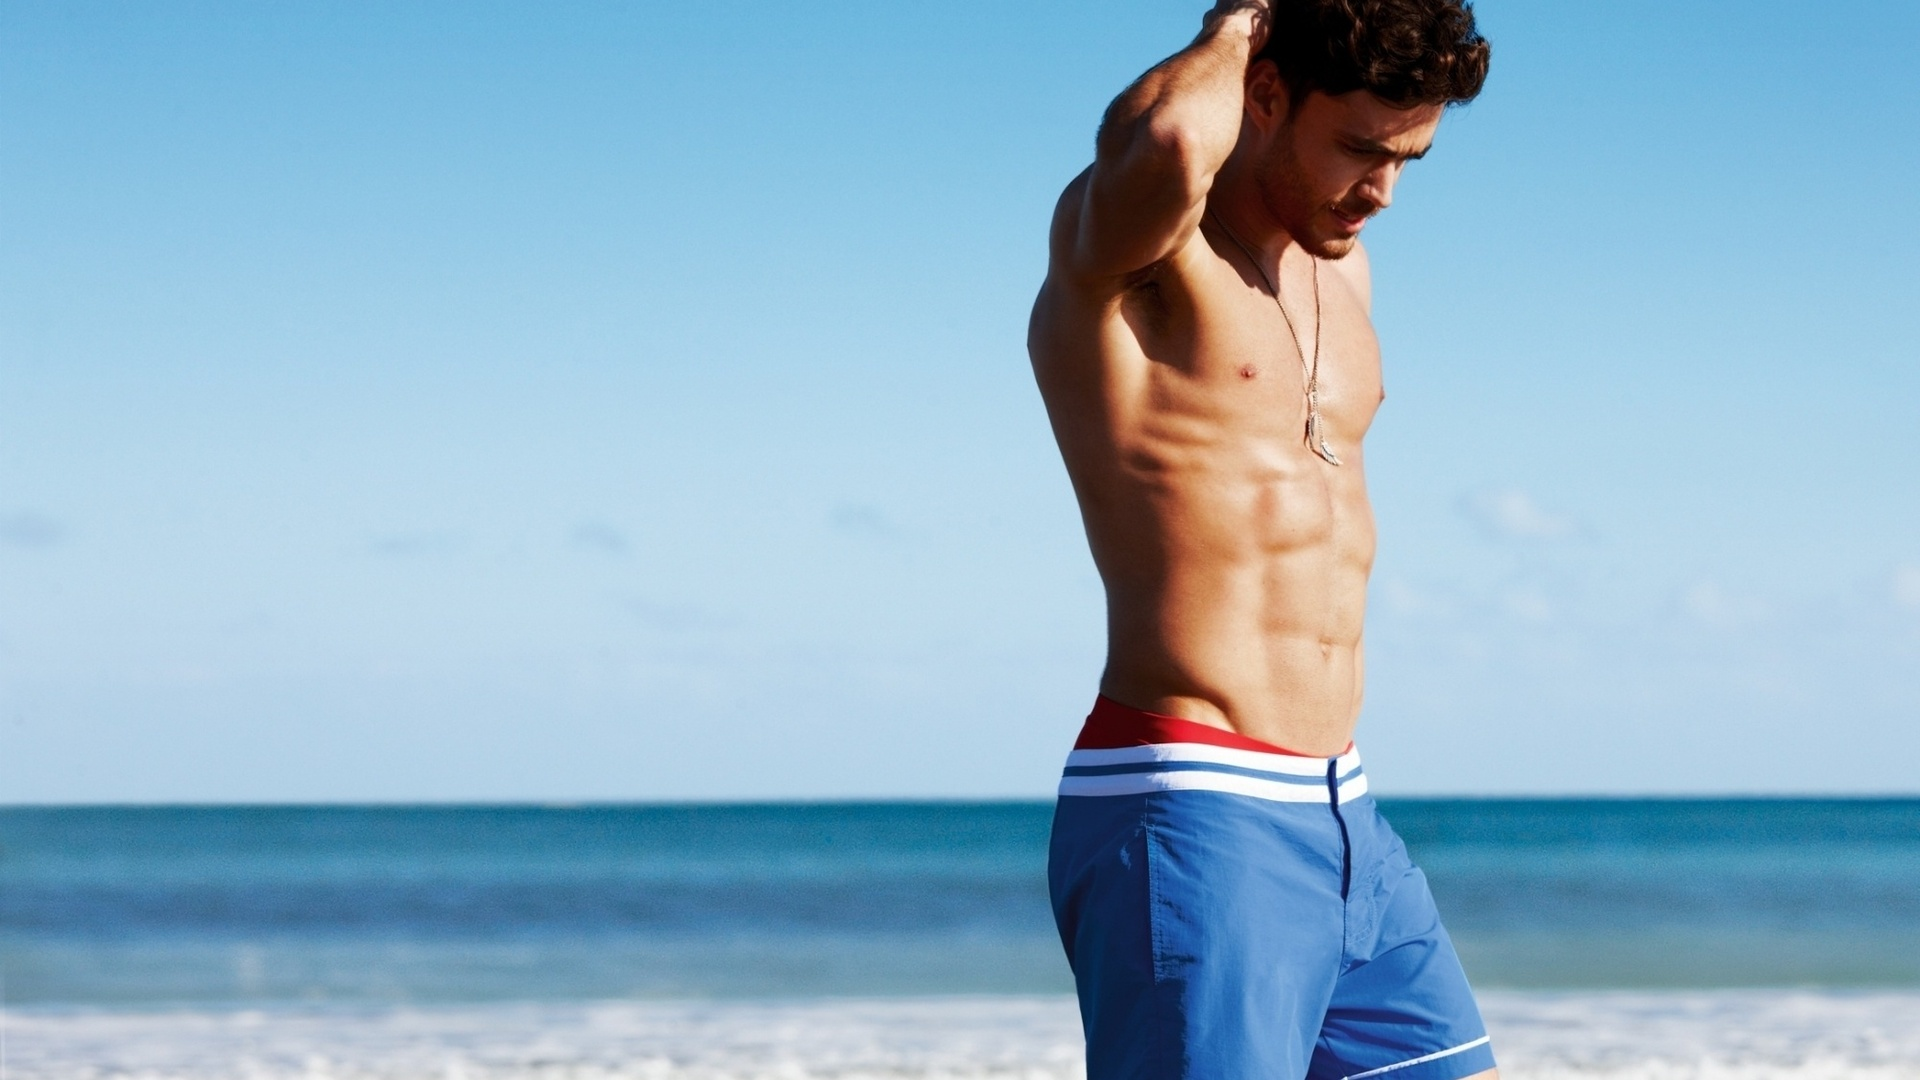 Мужик на пляже картинки